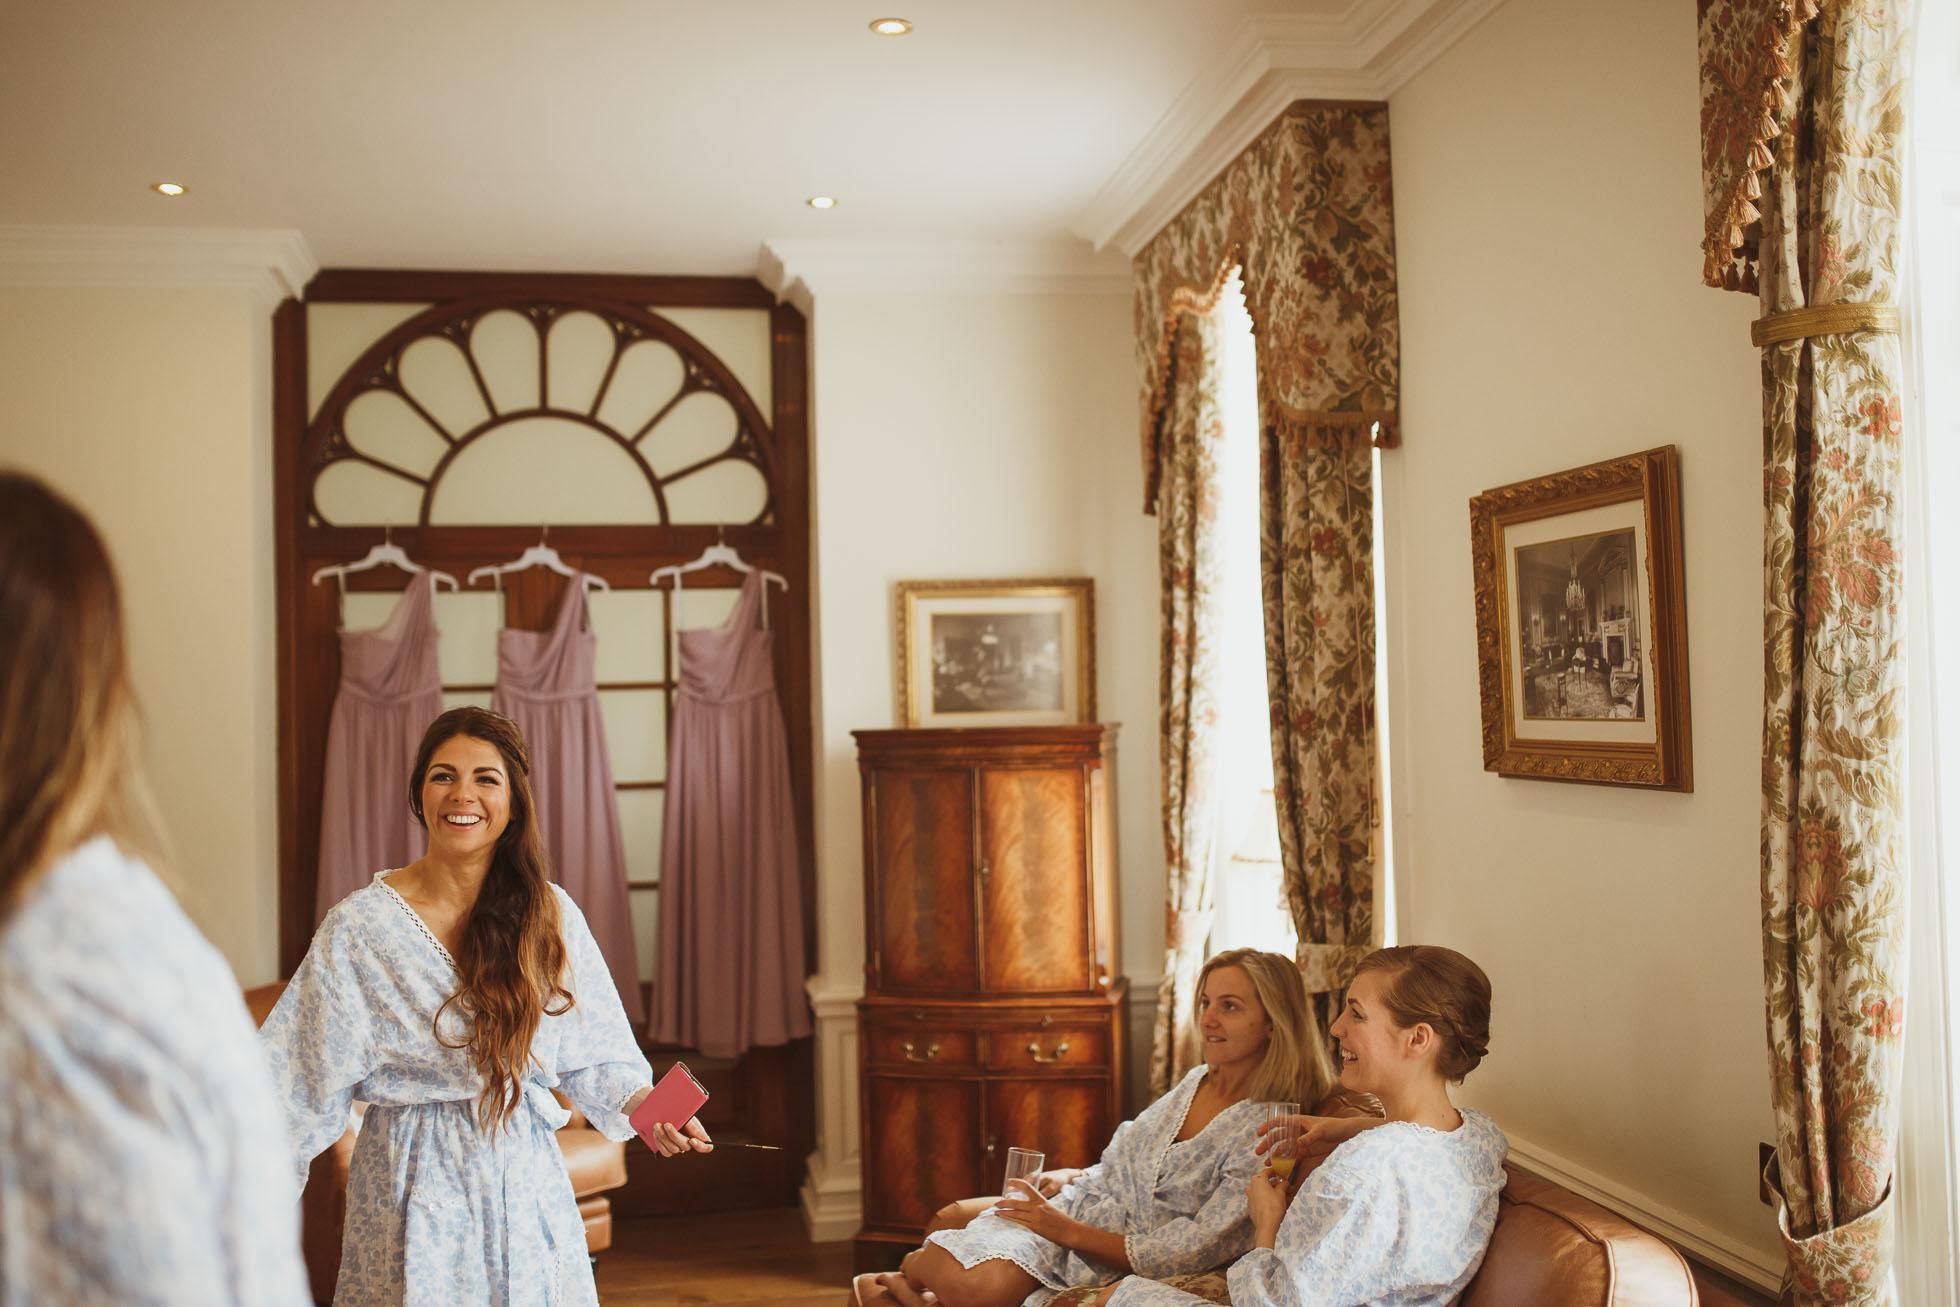 denton-hall-wedding-photographer-7.jpg